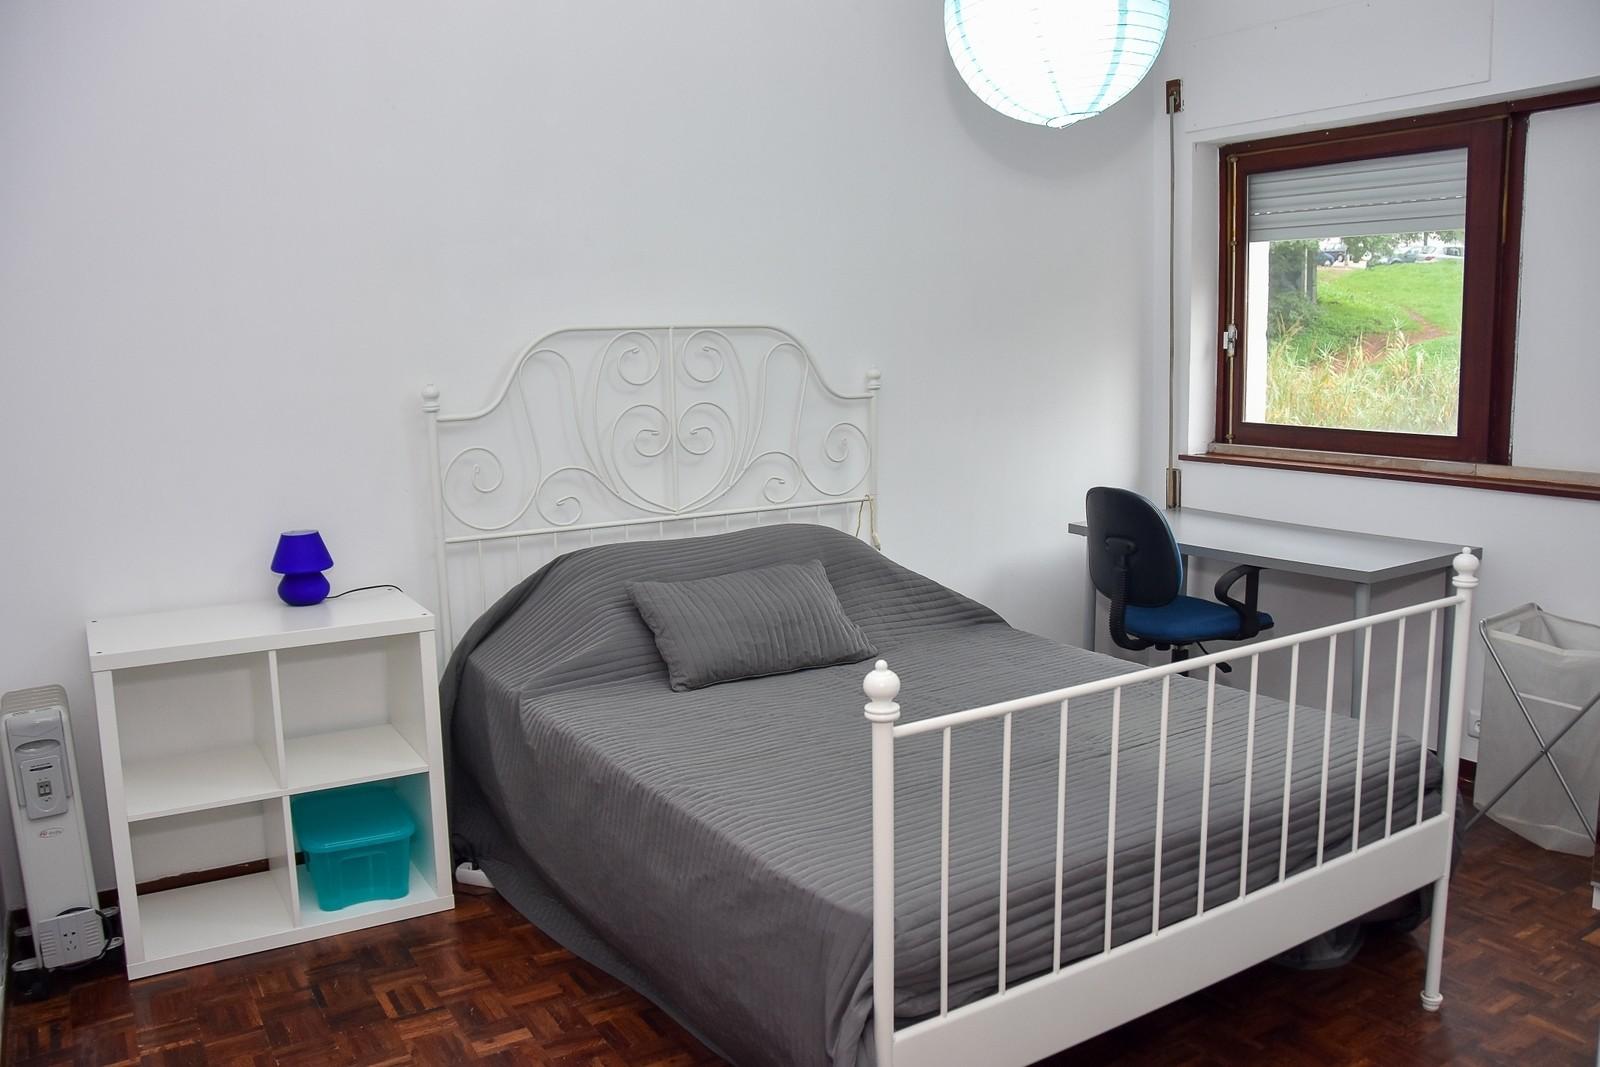 nice-single-room-polo1-2-3-contract-i-nt-ask-payement-advance-85a21e5beb6e76619f5a4d37a5ea1e38